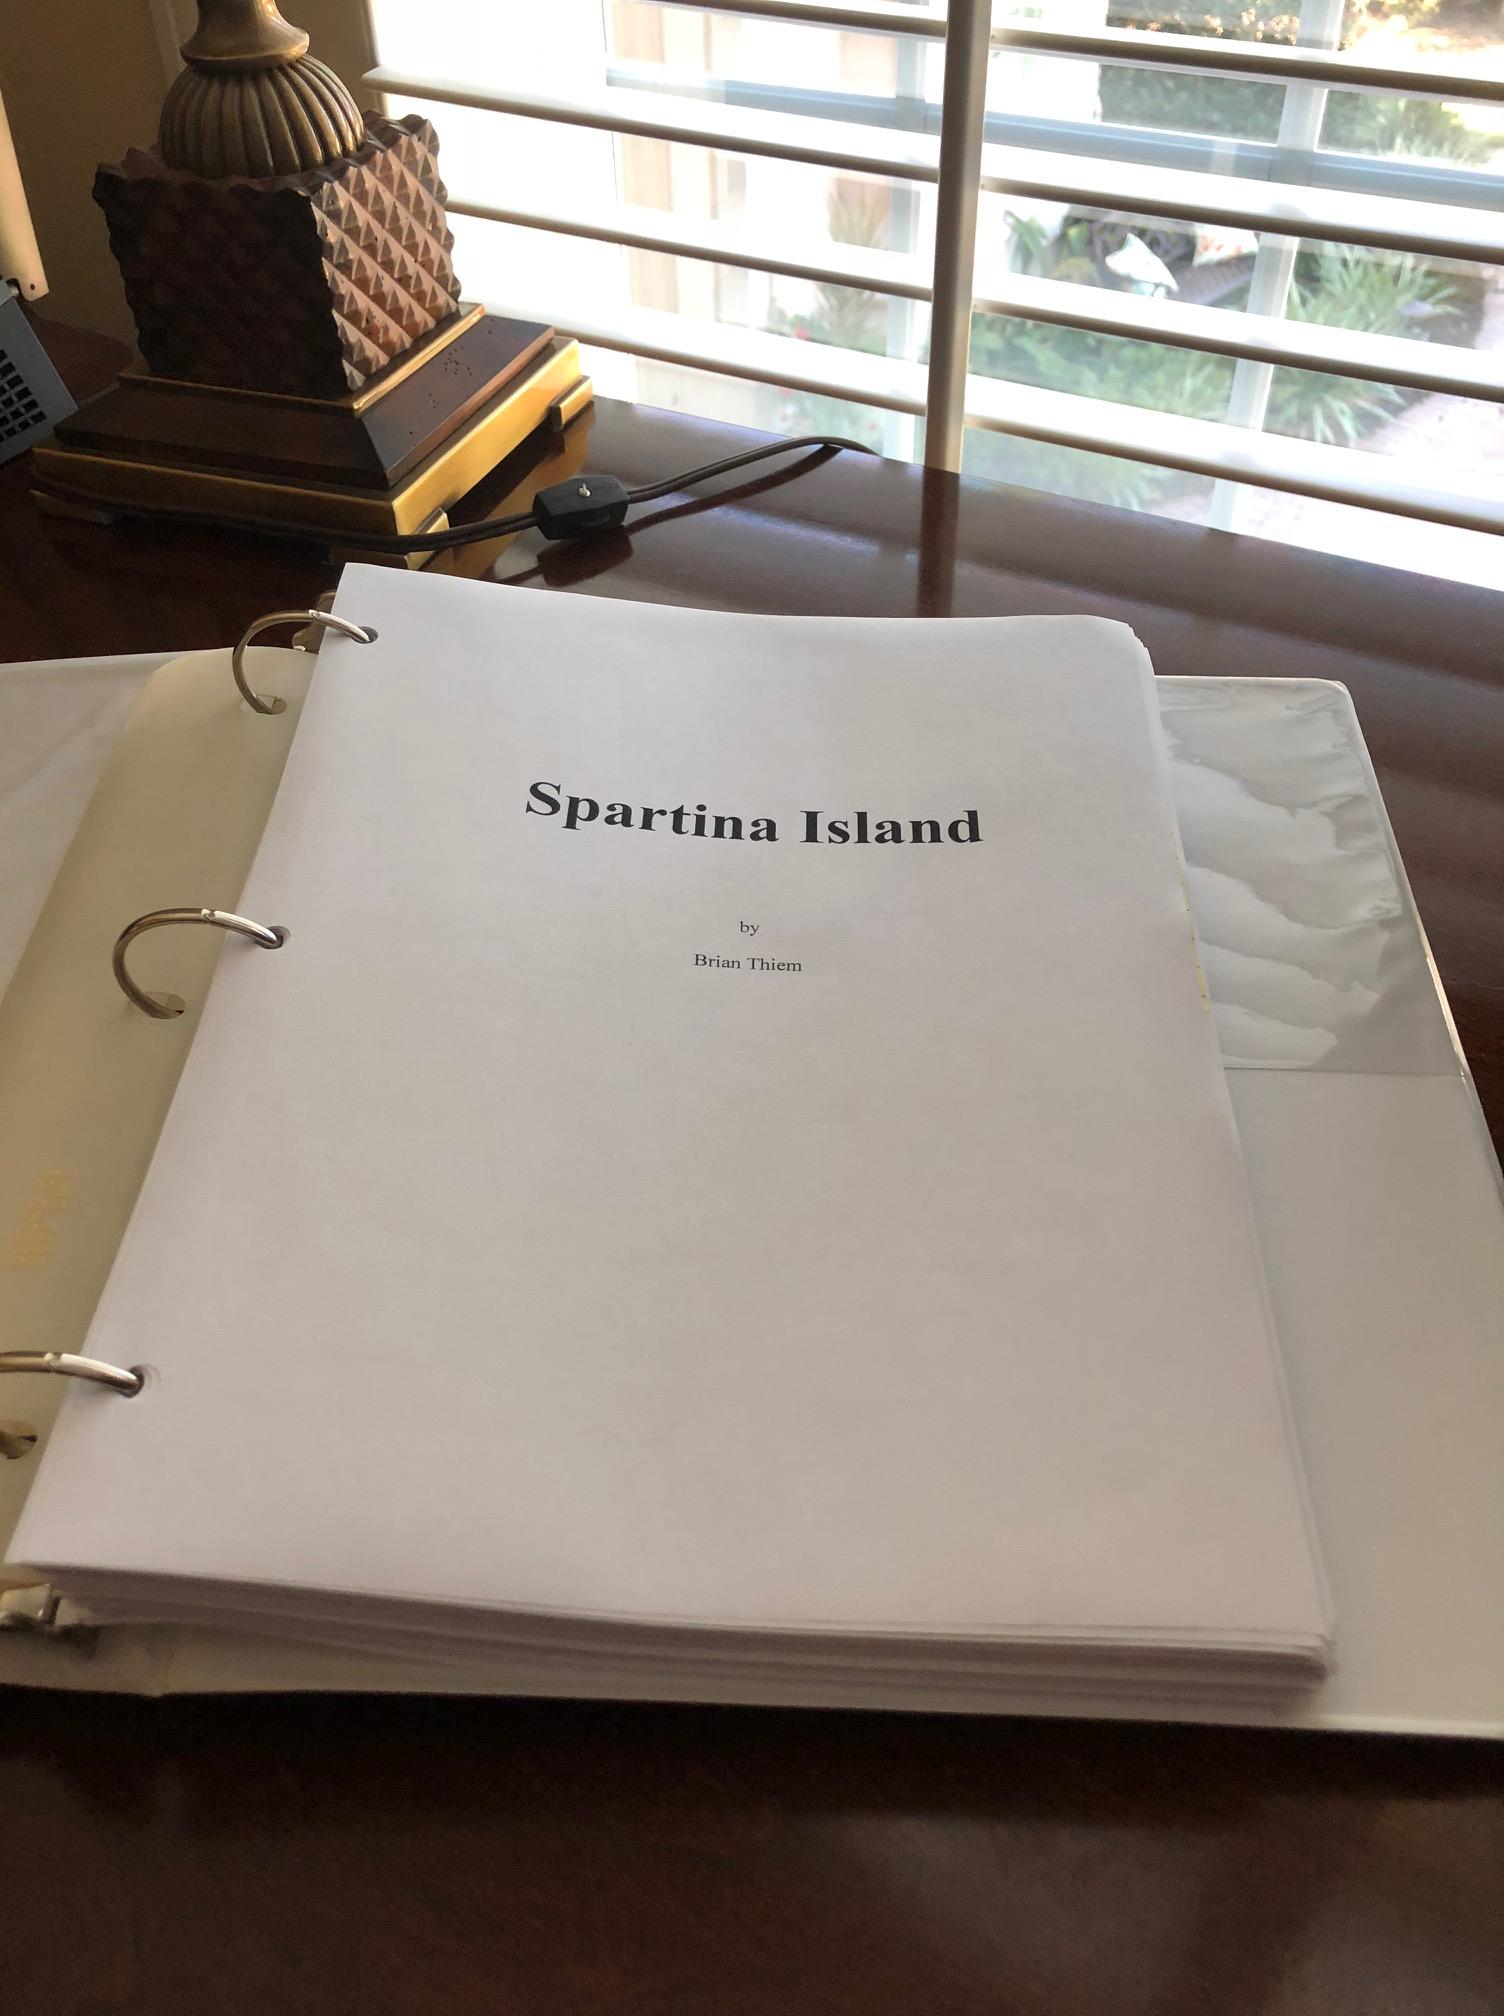 Spartina Island Manuscript